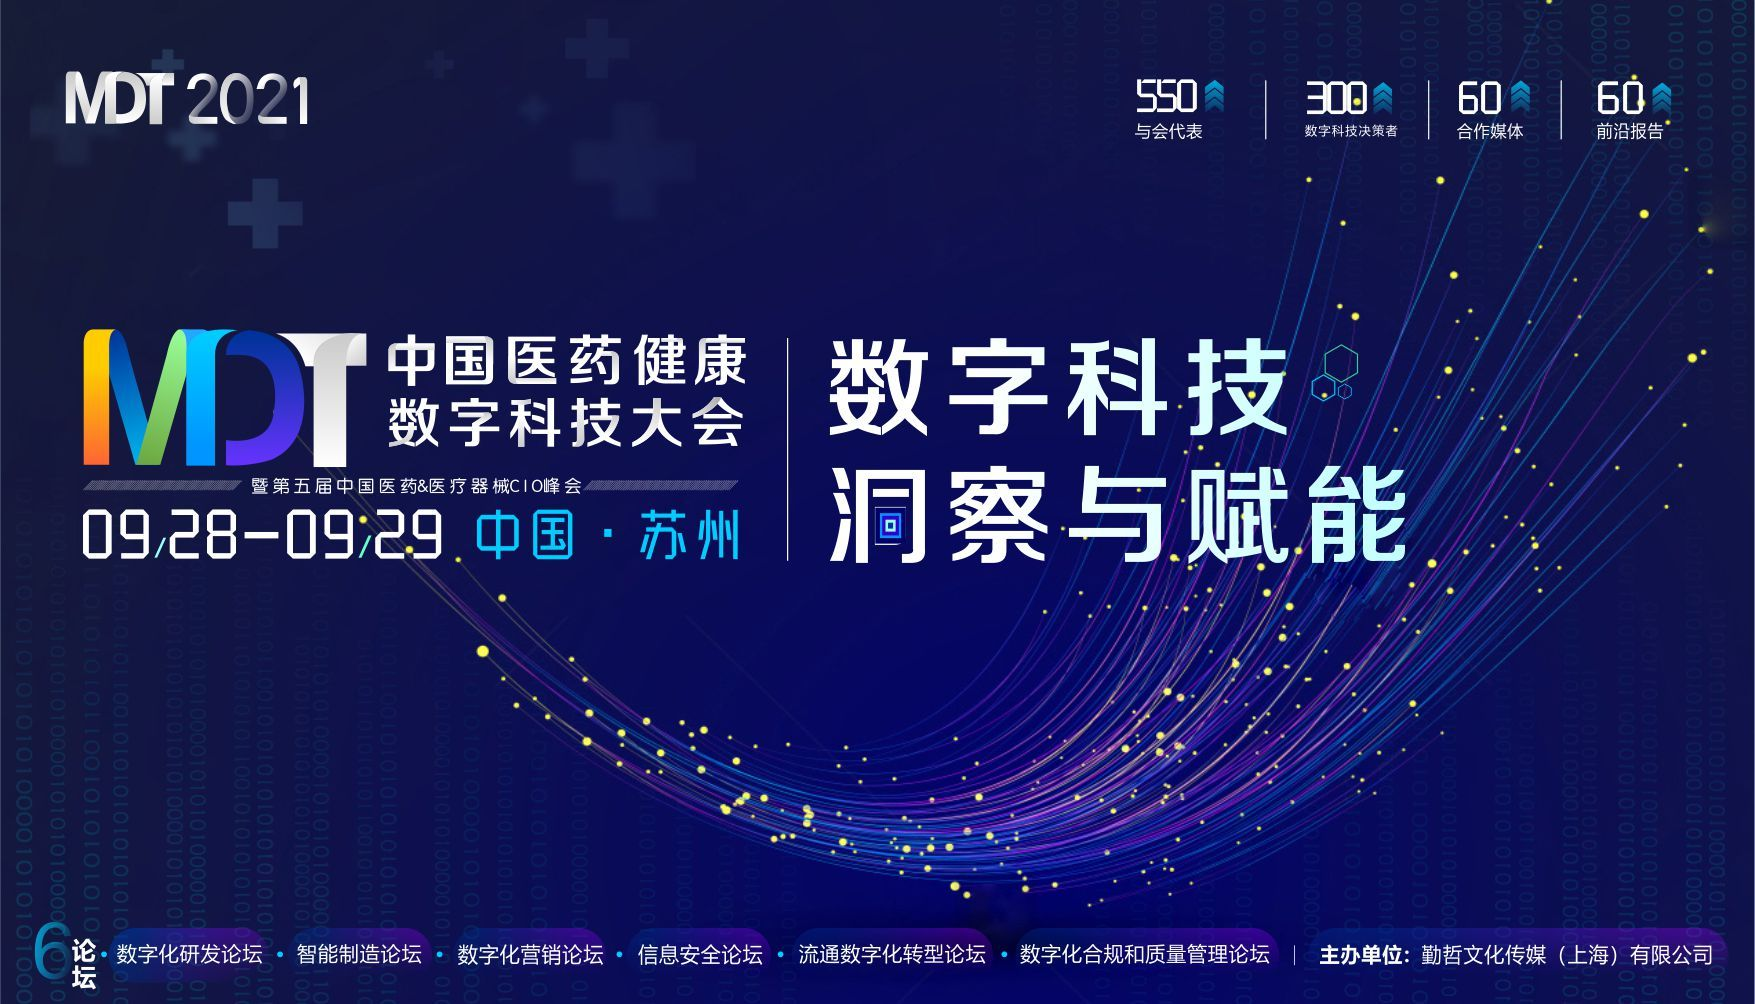 MDT 2021中國醫藥健康數字科技大會